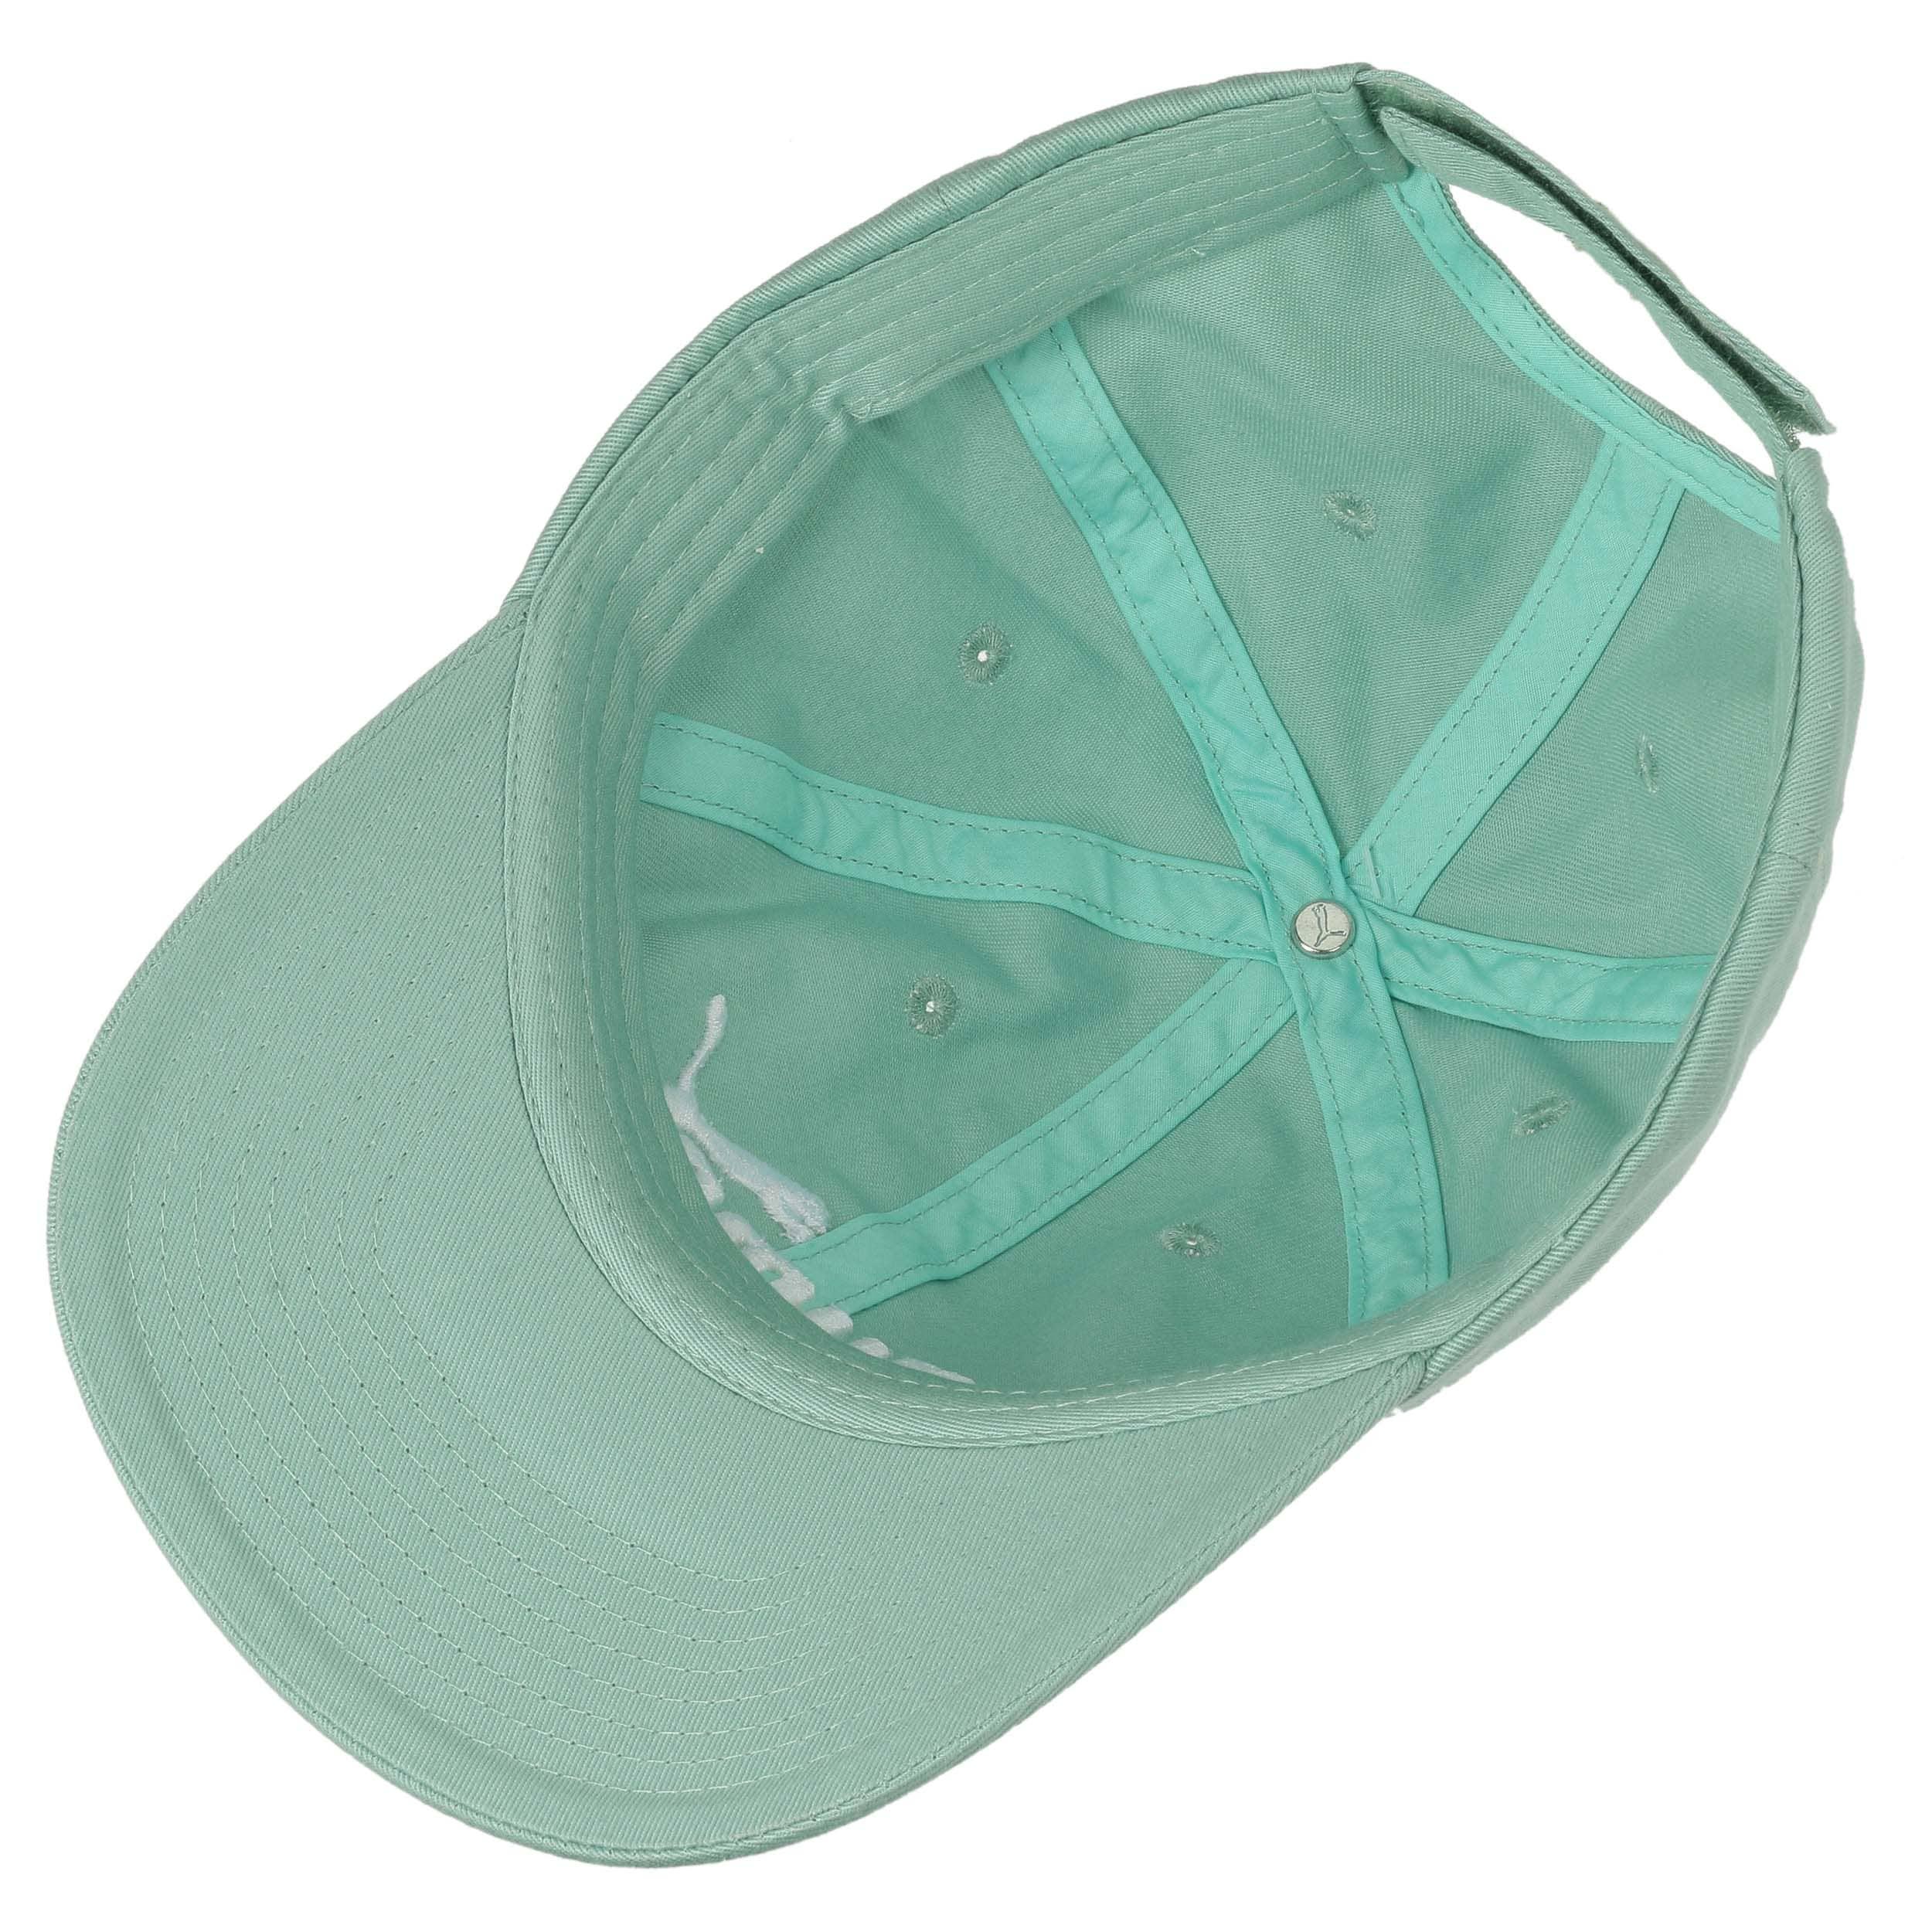 1 Baseball Cap by PUMA - mint green 2 ... b1c886d6e66